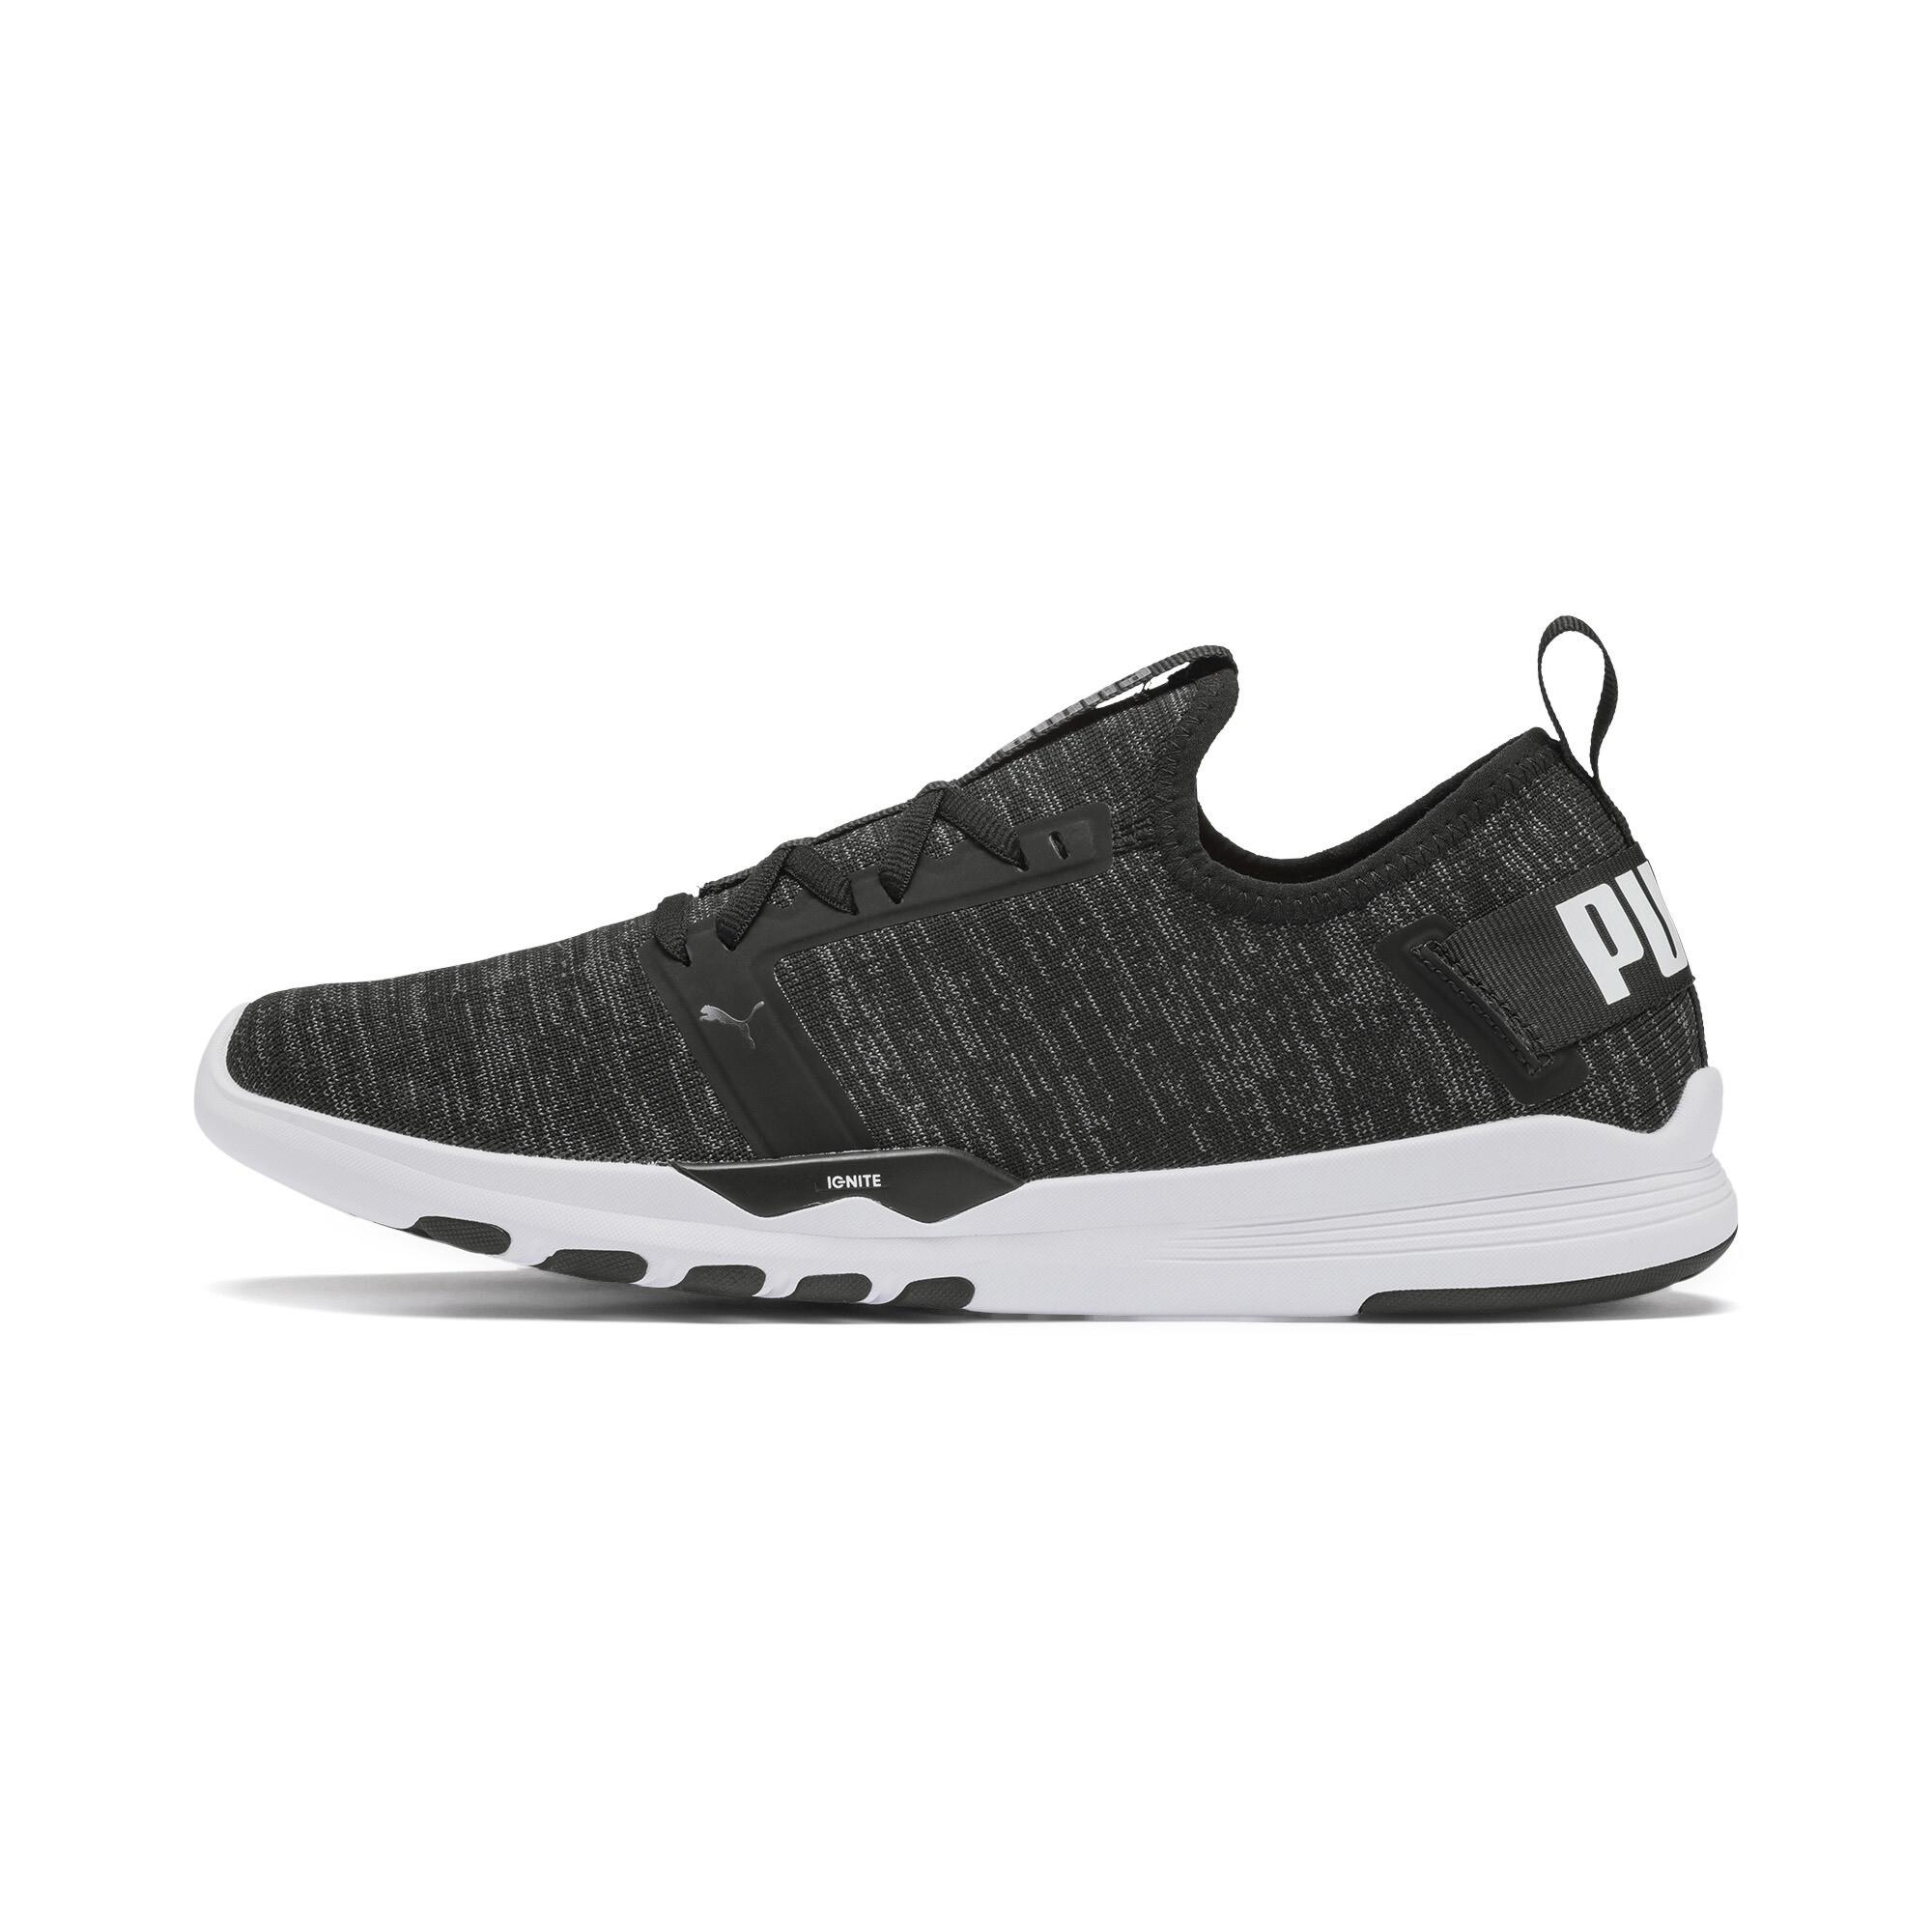 PUMA-Men-039-s-IGNITE-Contender-Knit-Running-Shoes thumbnail 9